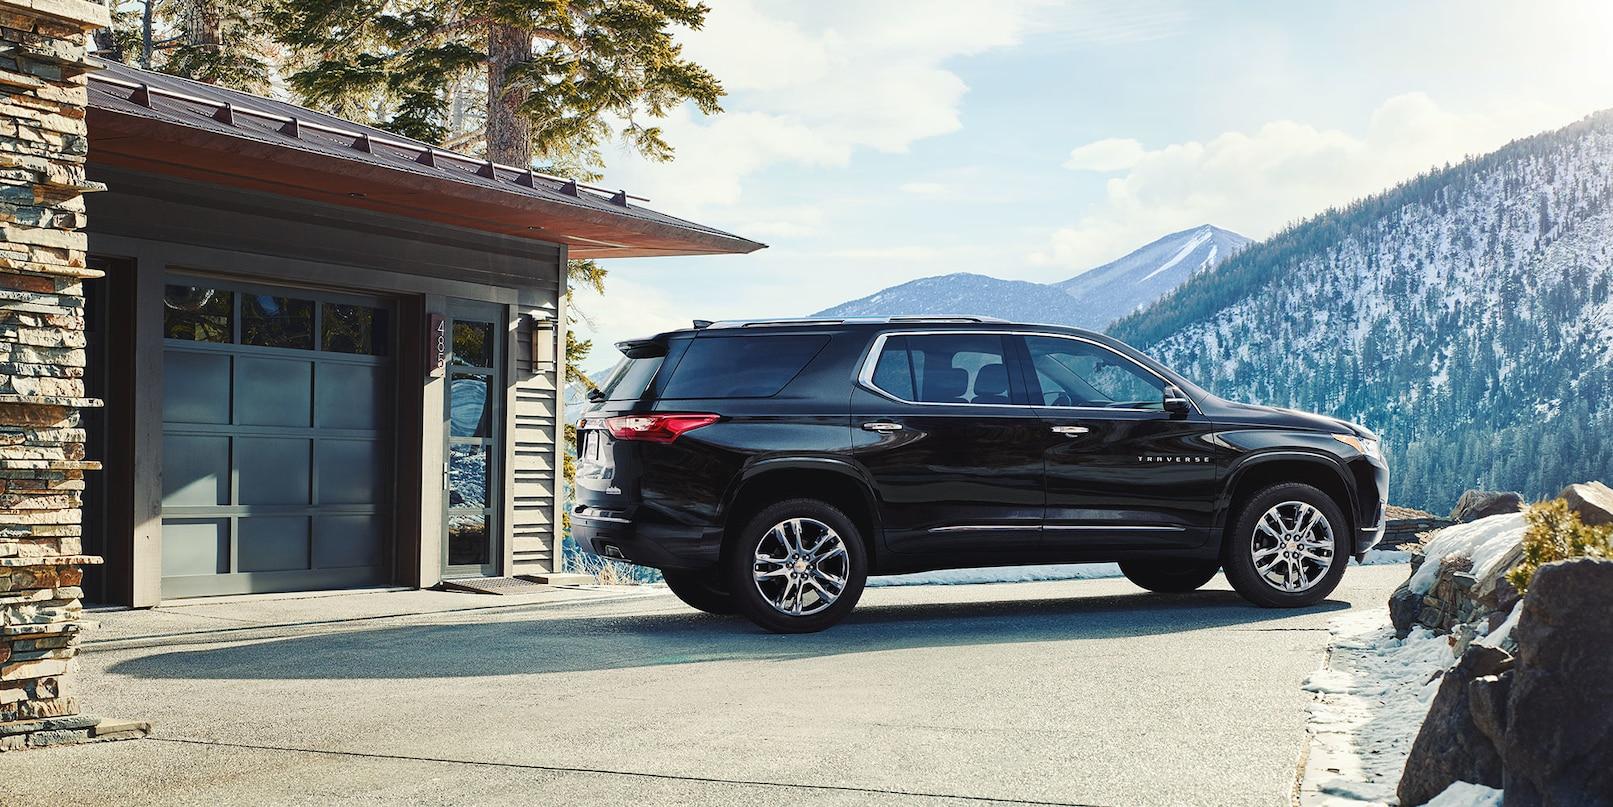 2019 Chevrolet Traverse Leasing Near Mobile Al Terry